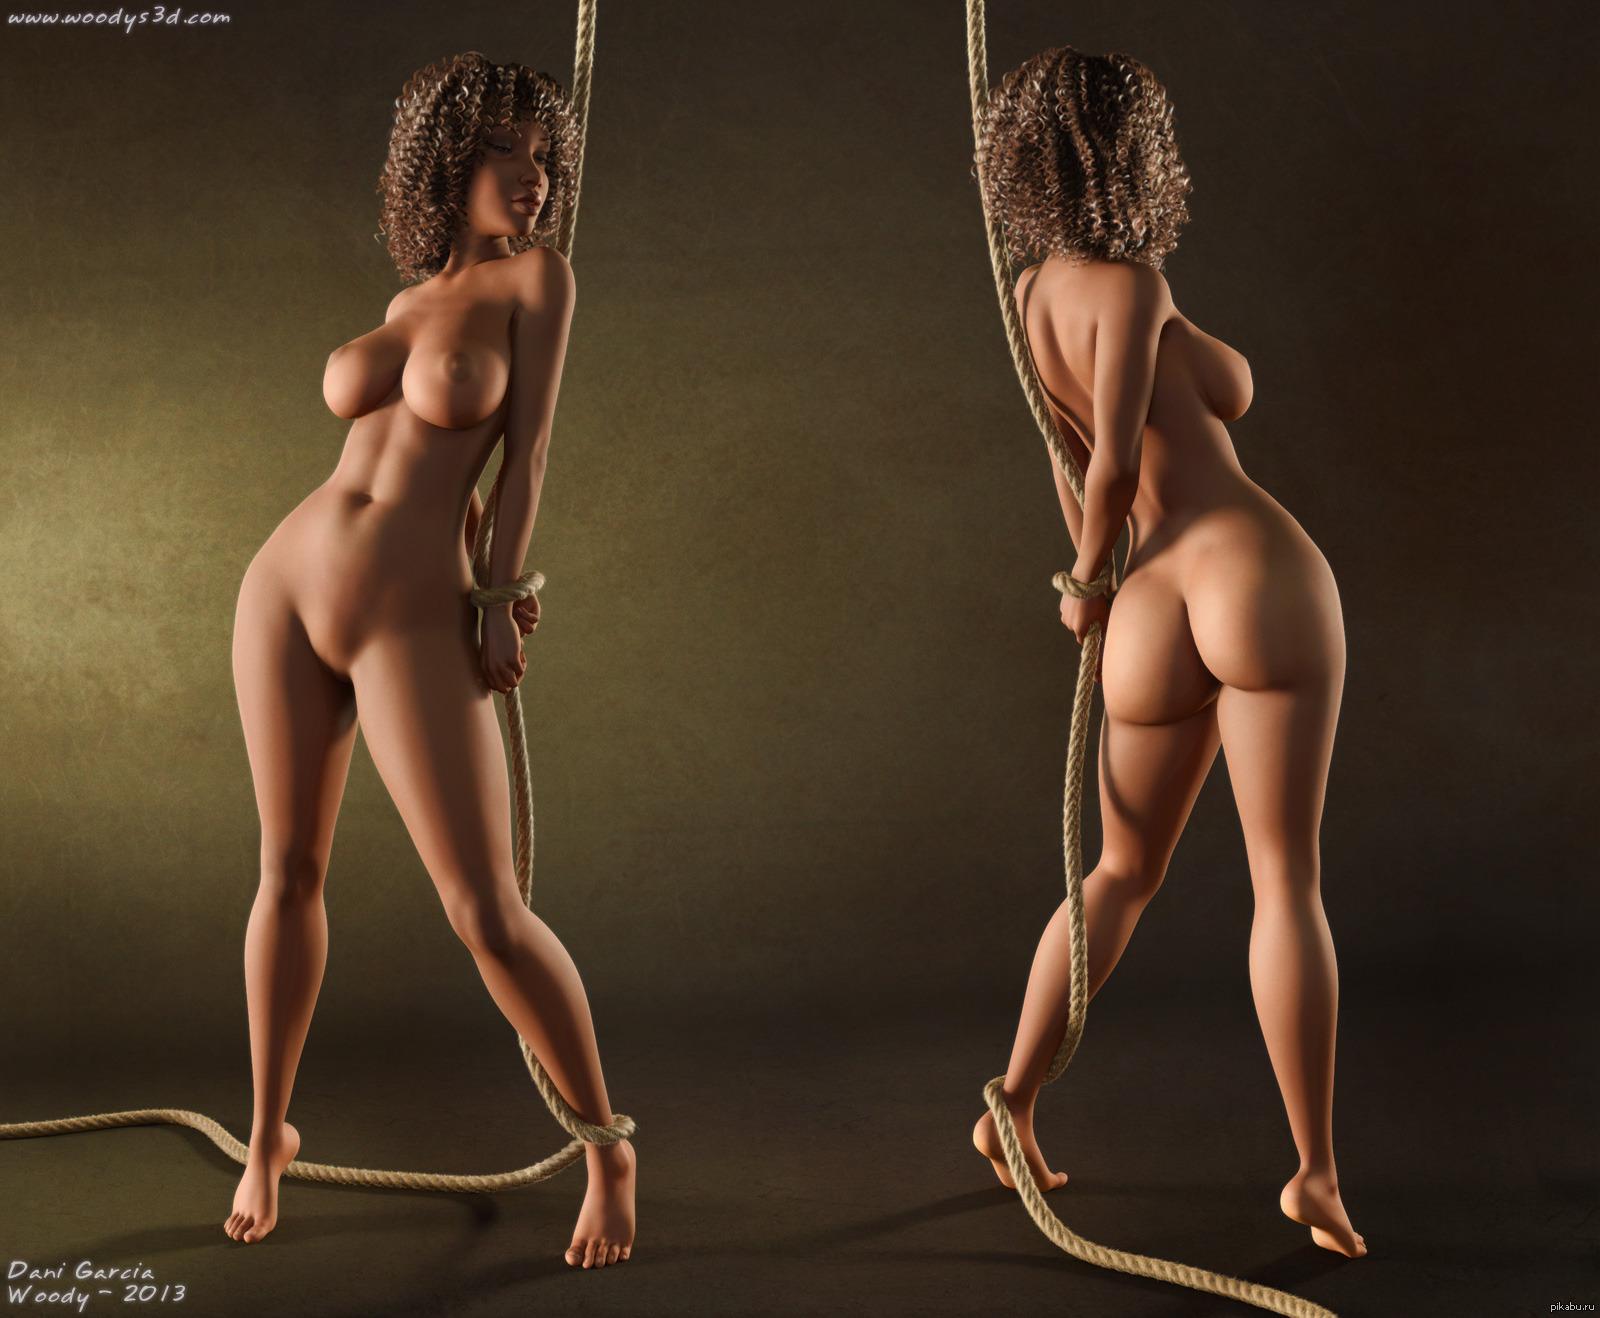 3d sexy girl models exploited film